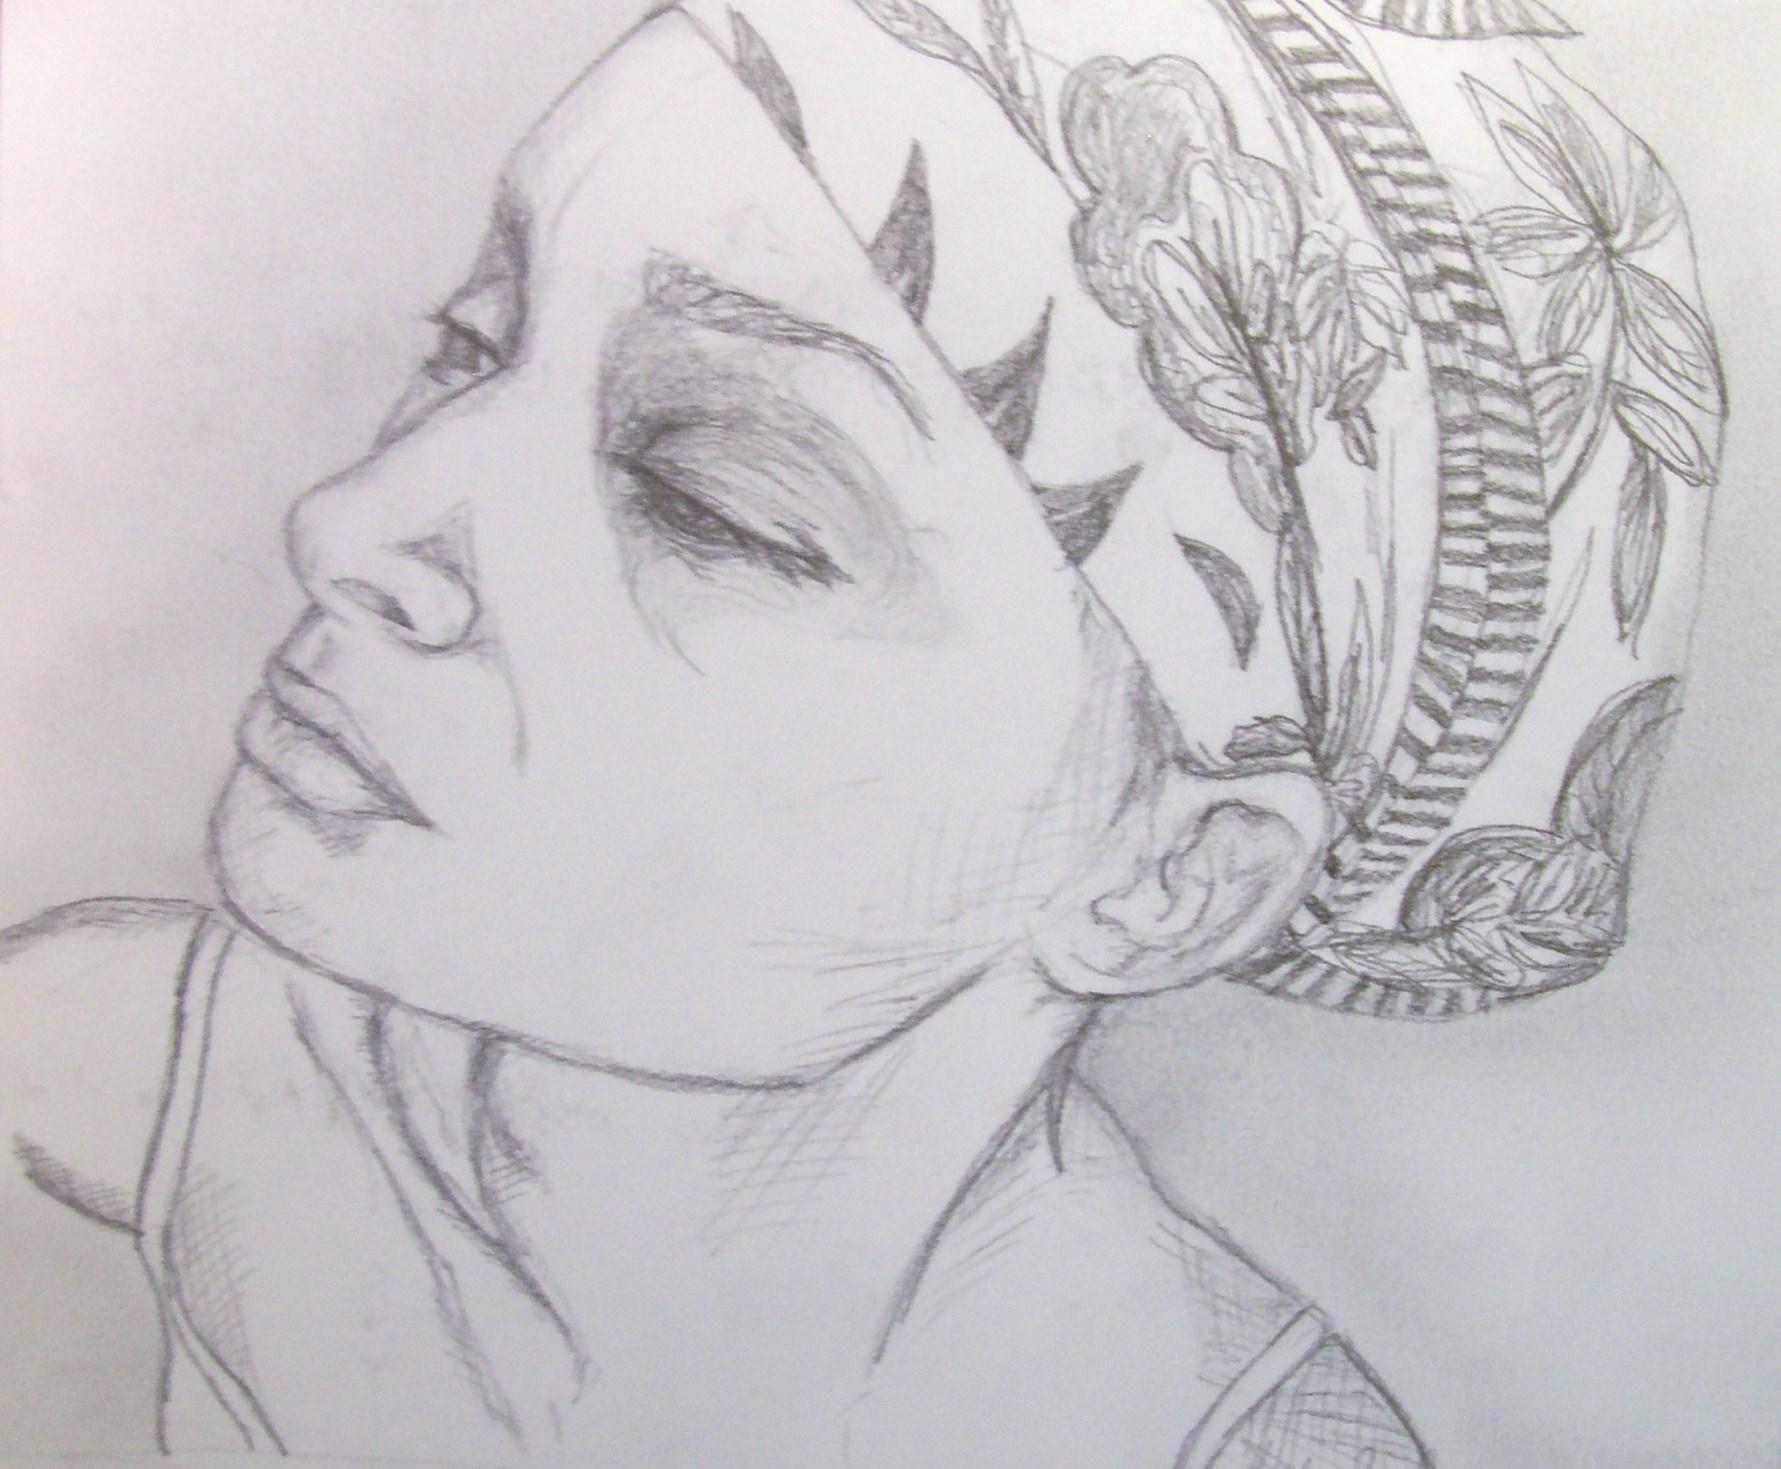 Sometimes I Forget I'm an Artist